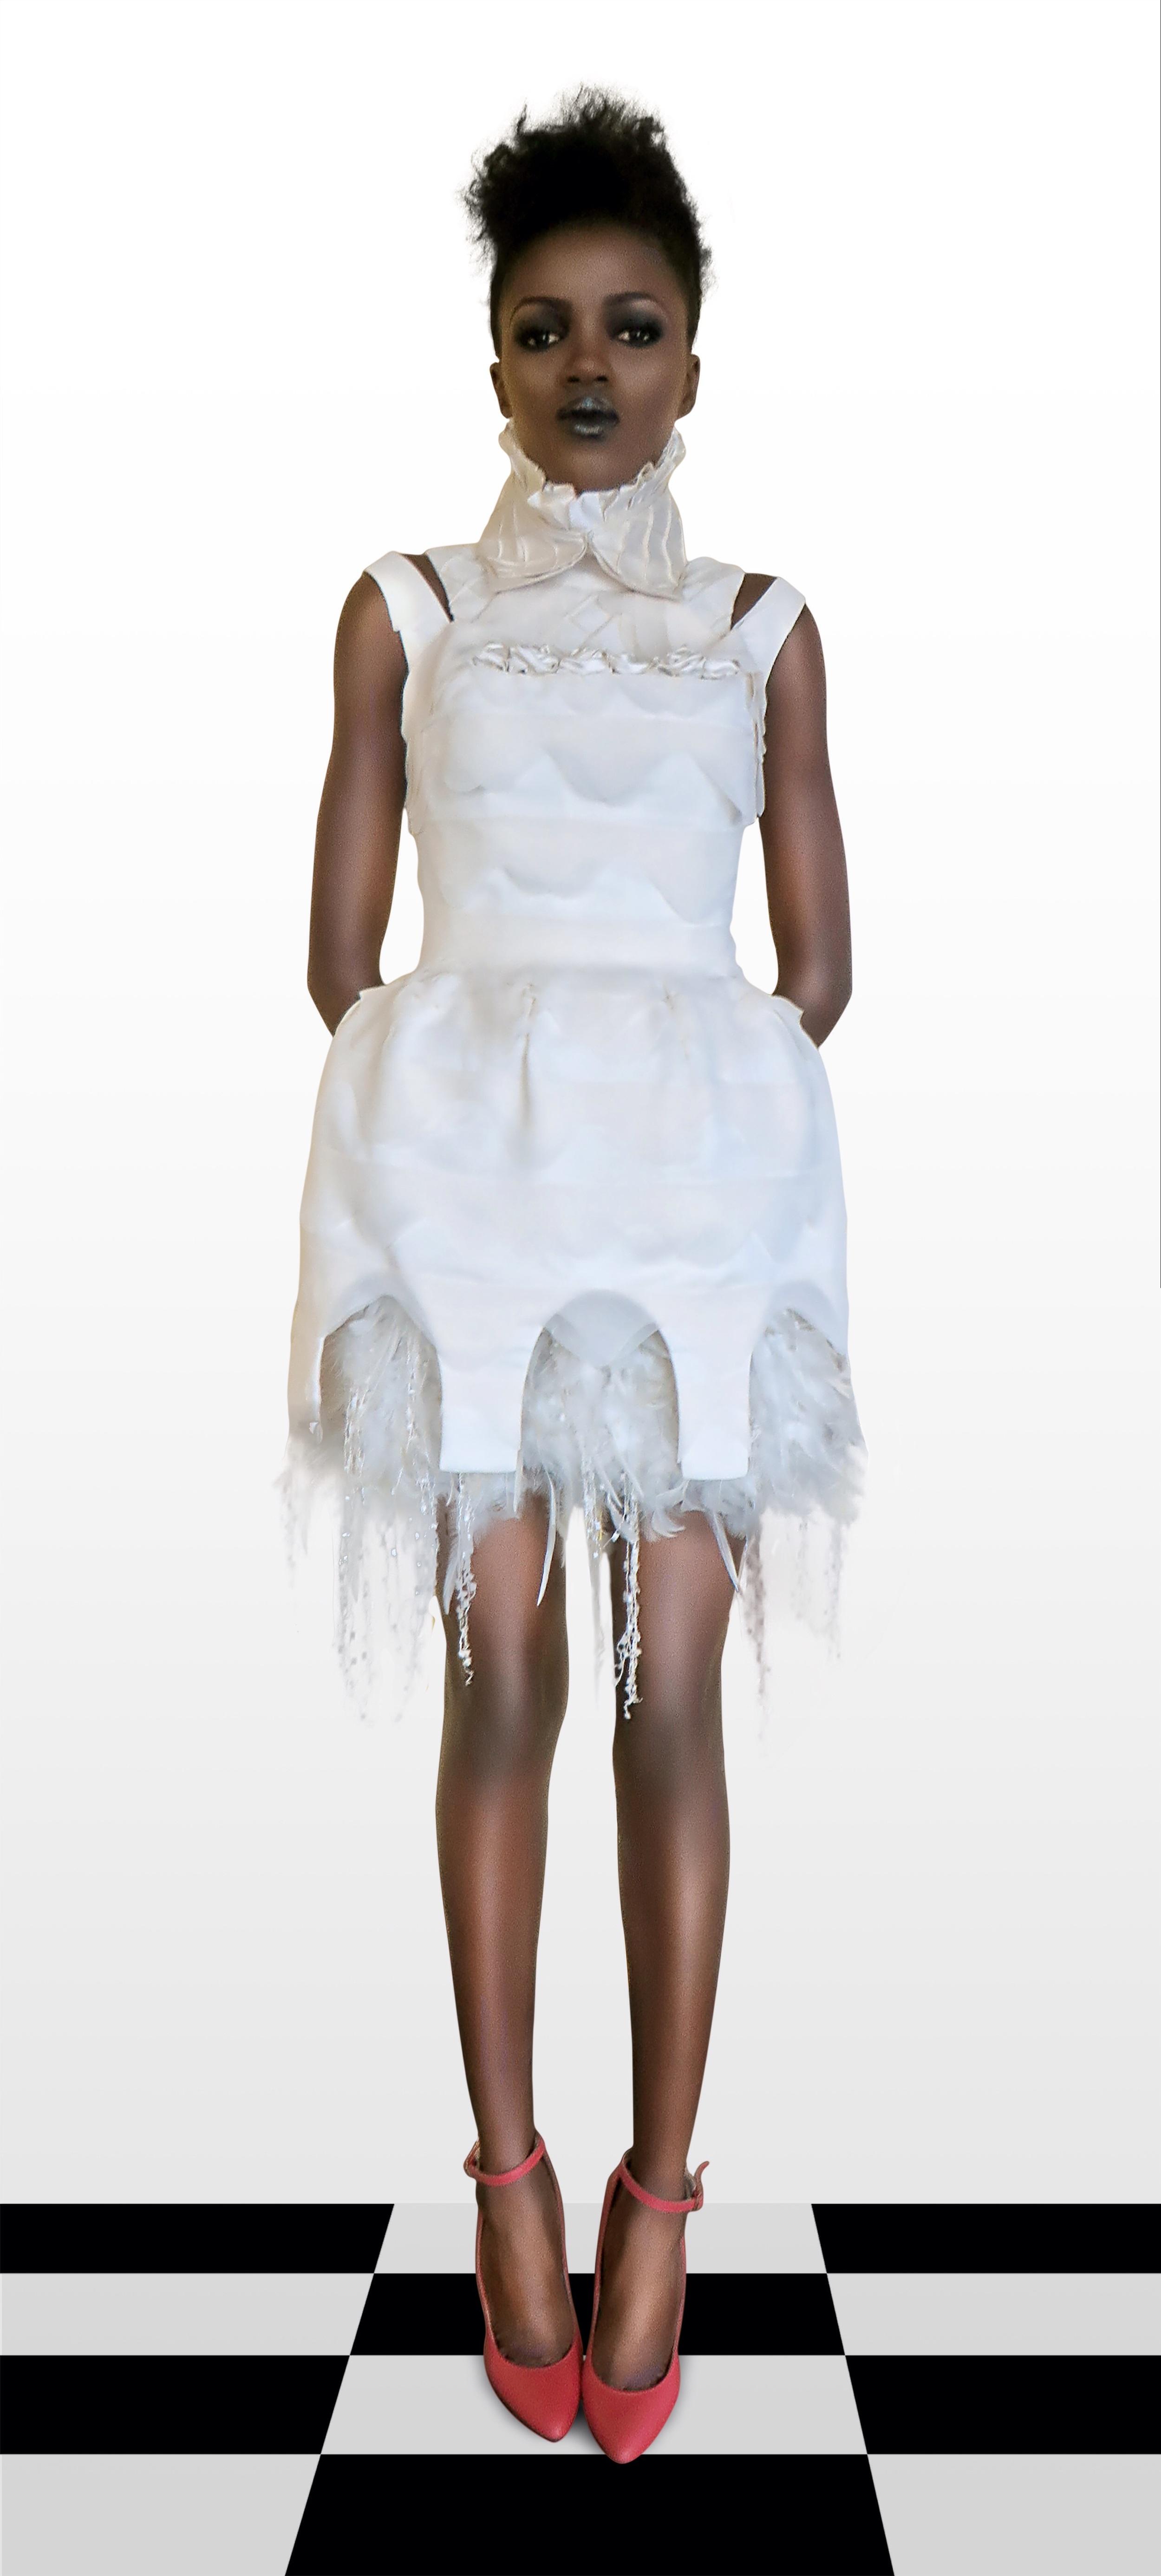 Dress, Photography & Styling: Eyola   Models: Abisola, Precious, Deborah   Hair & Makeup Stylist: Omalicha makeover